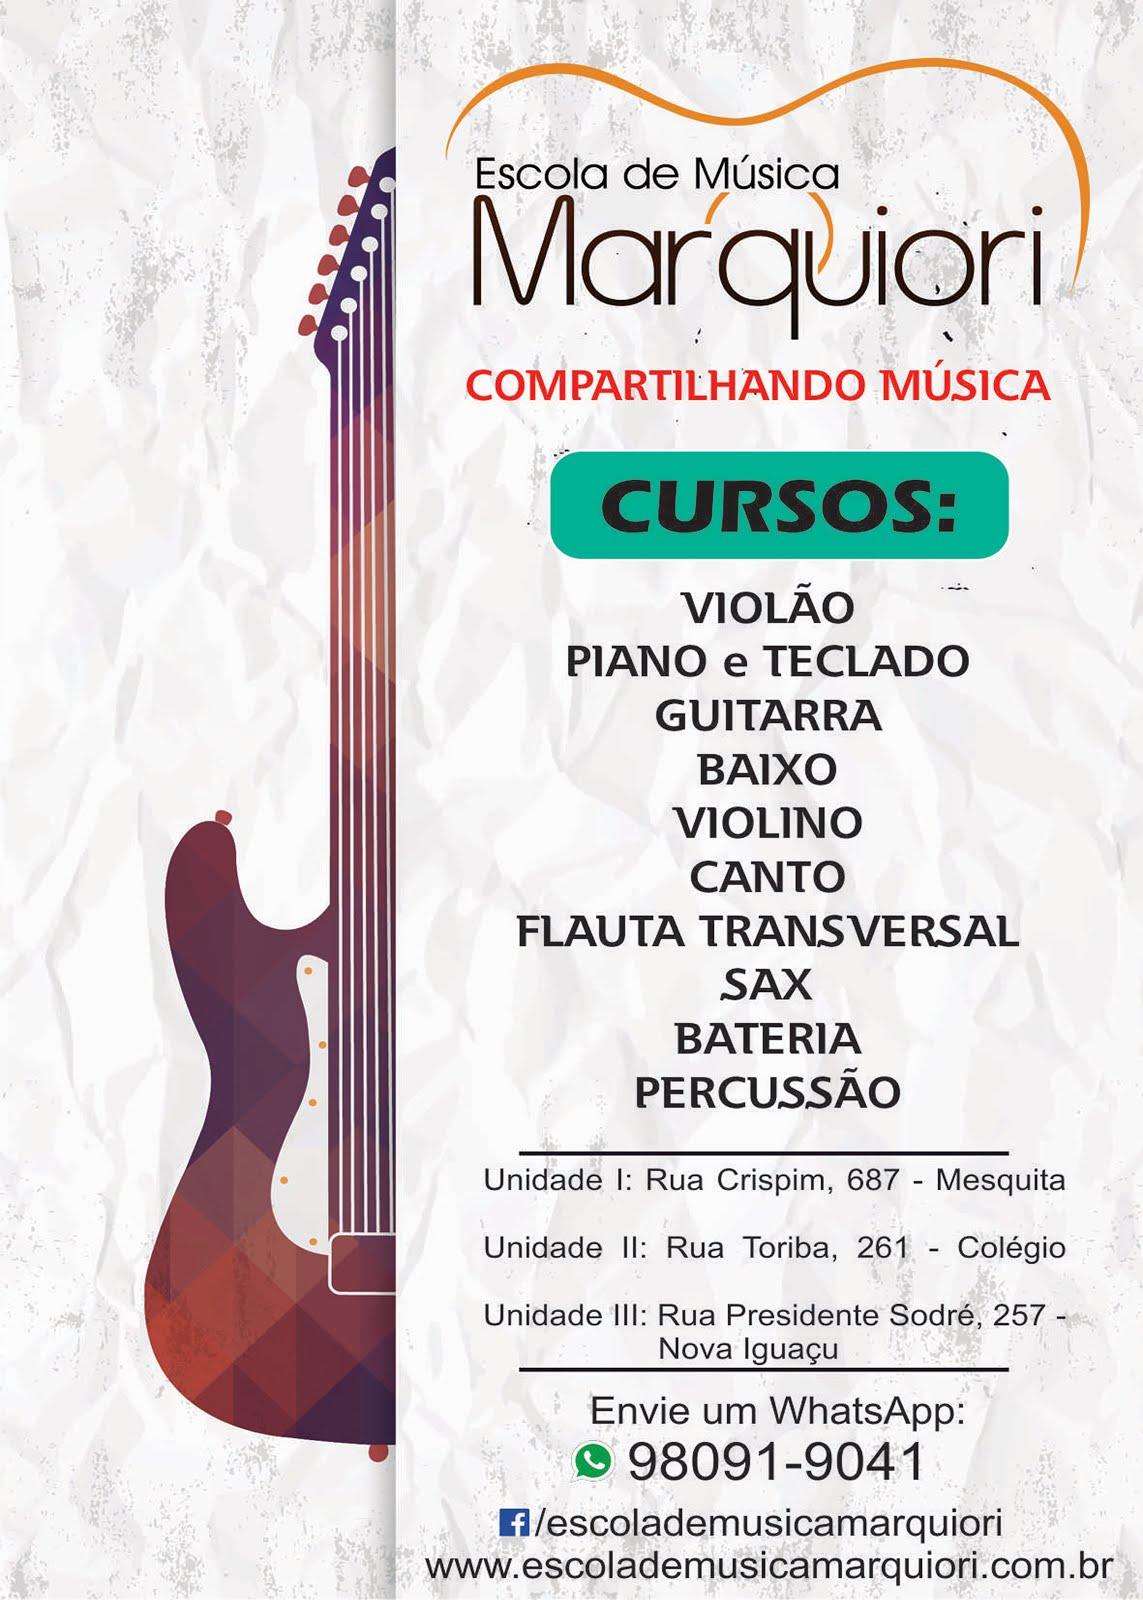 ESCOLA DE MÚSICA MARQUIORI